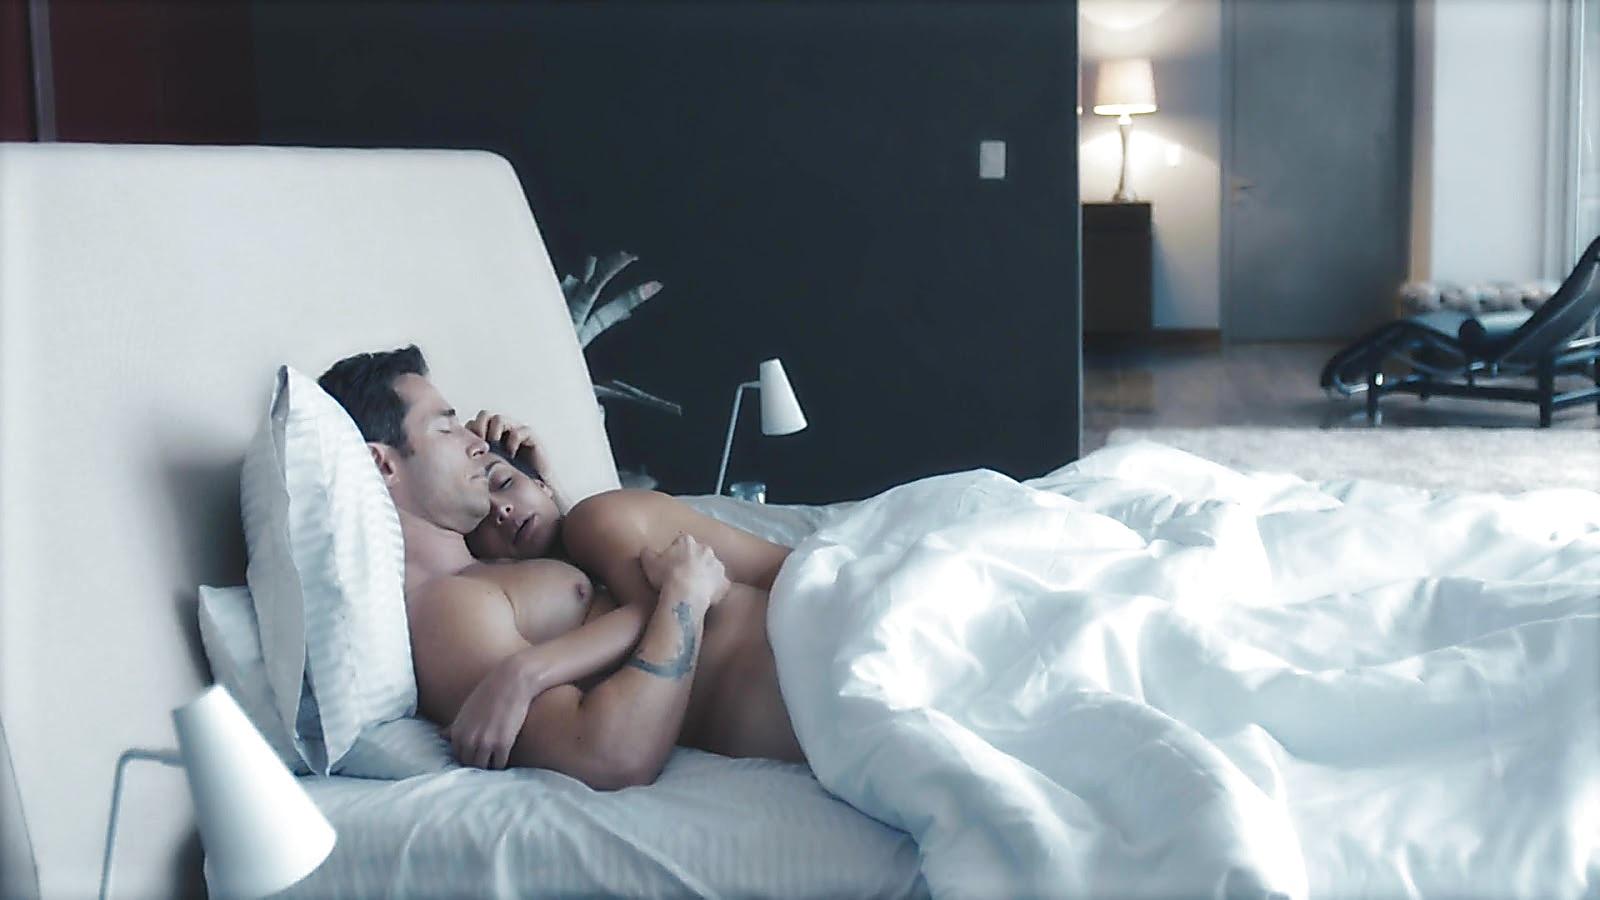 Sebastian Rulli sexy shirtless scene October 4, 2019, 1pm